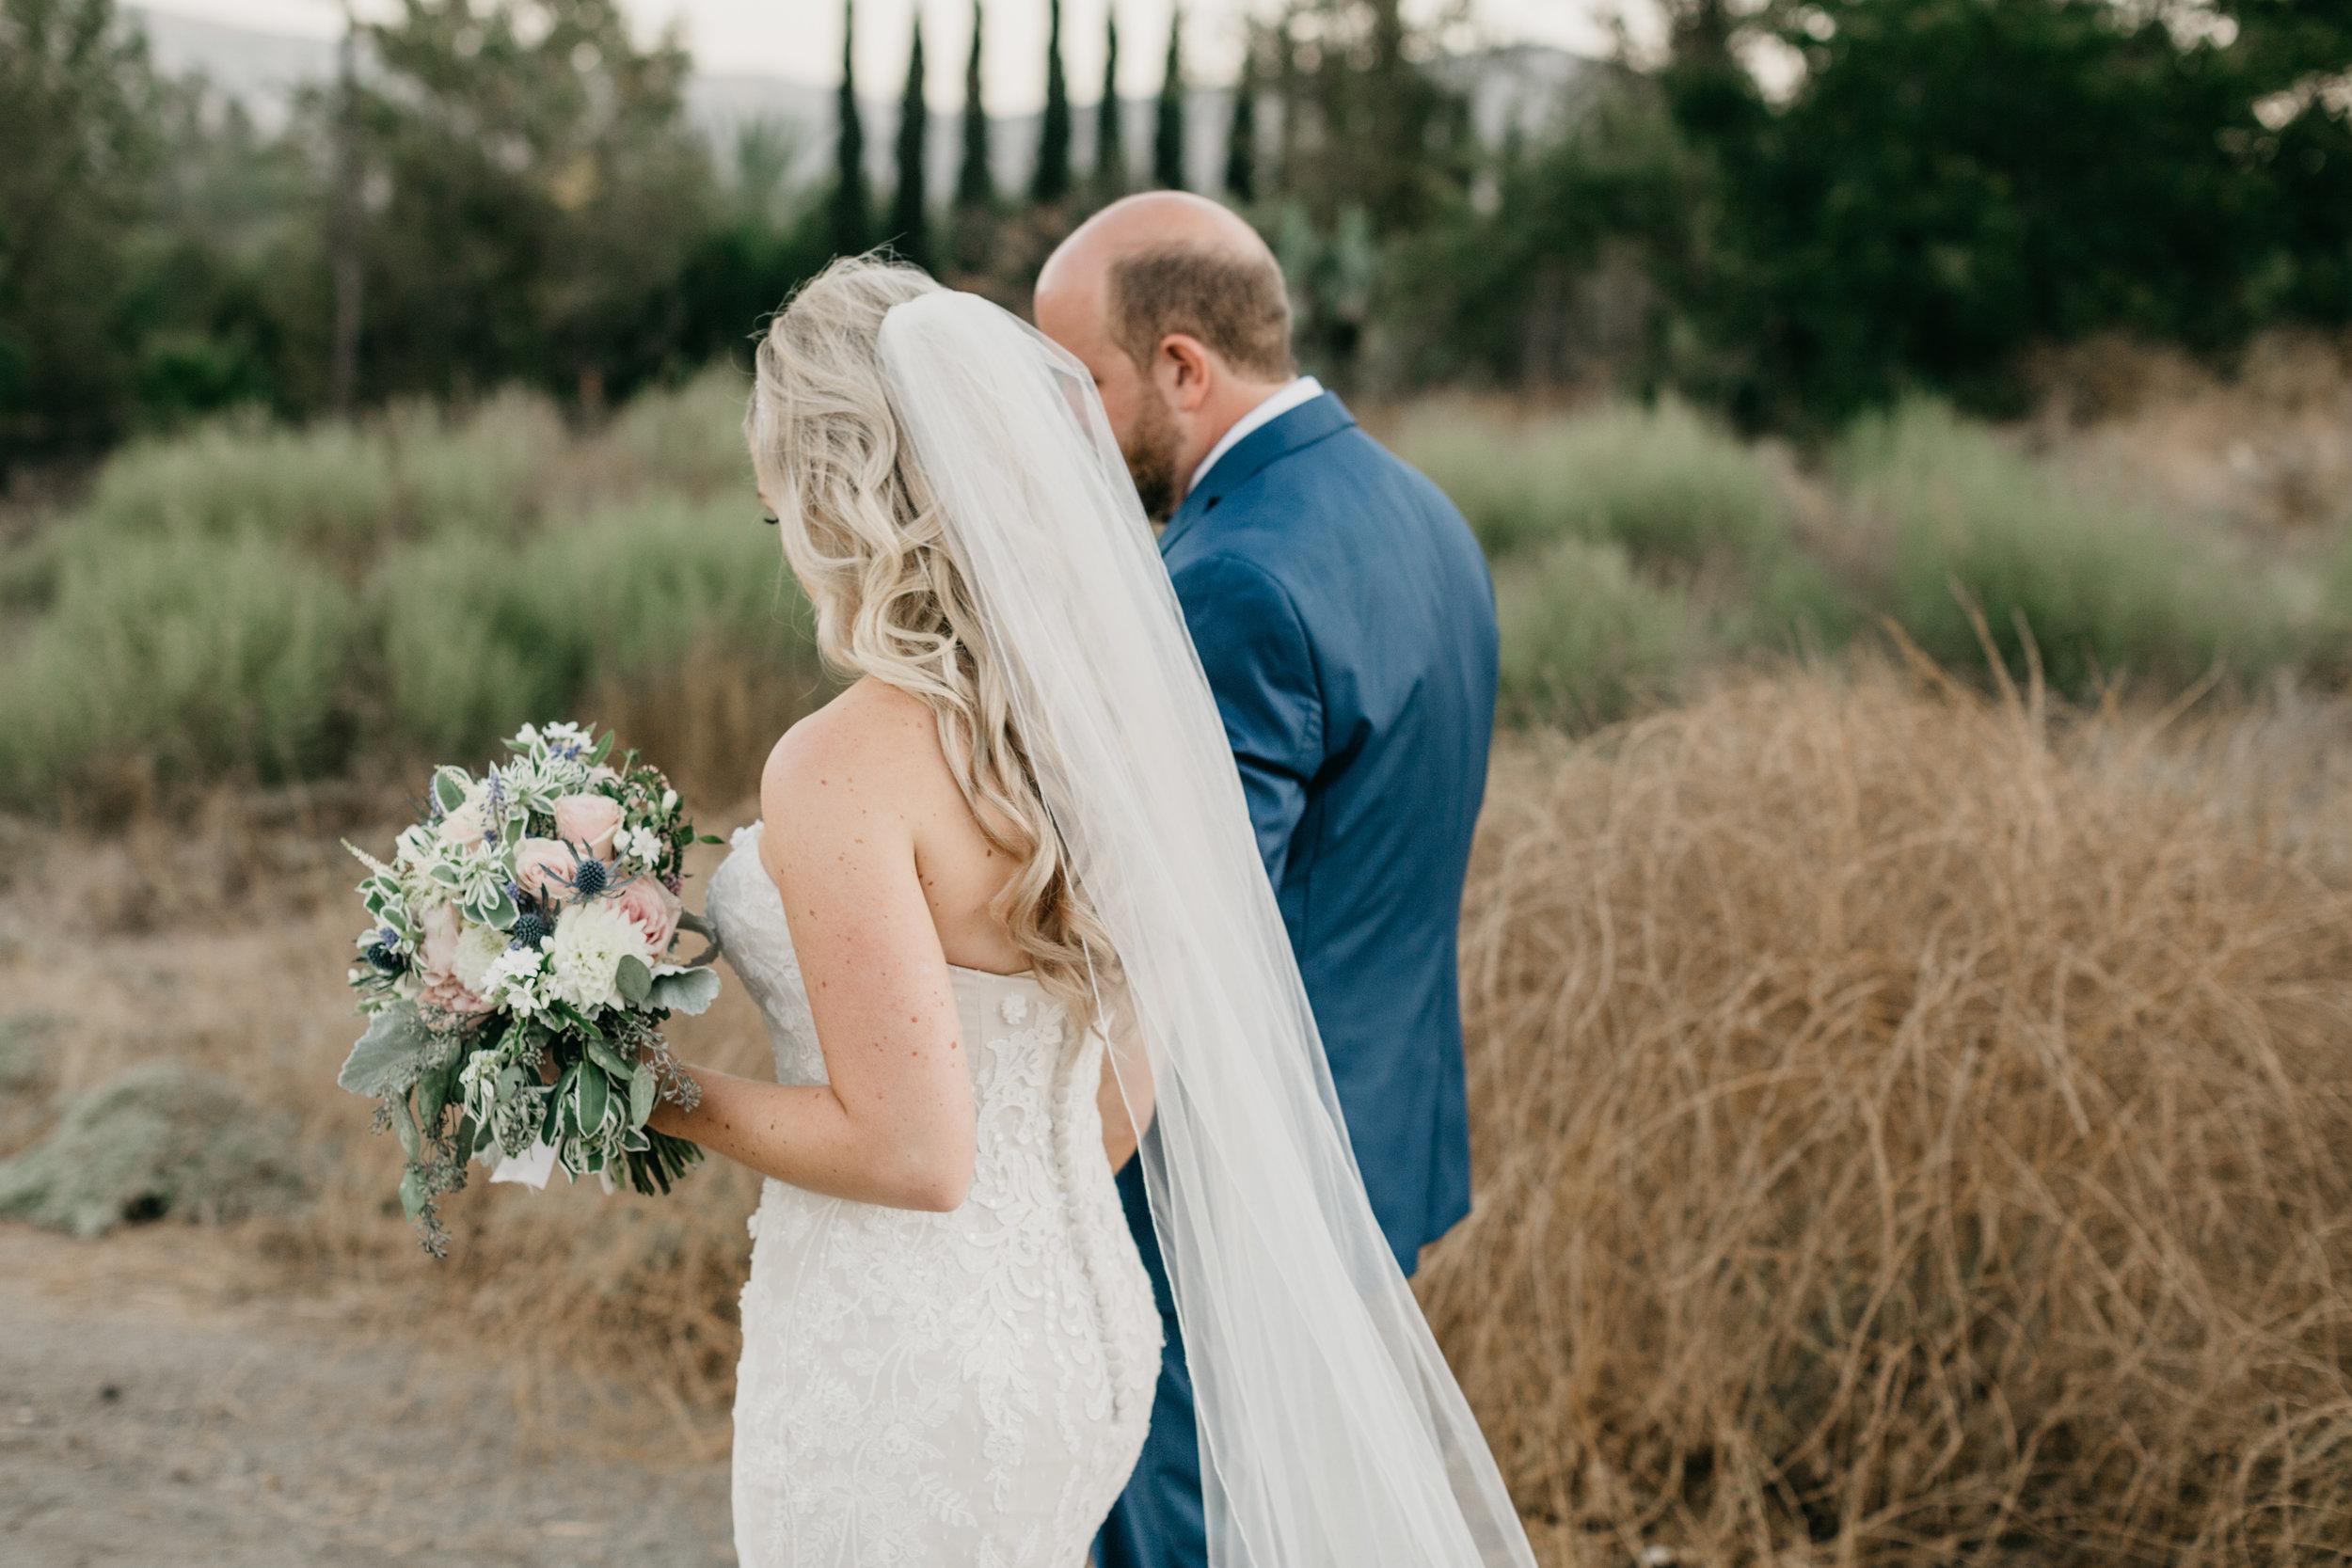 DianaLakePhoto-L+M-San-Diego-Wedding-Mr&Mrs56.jpg